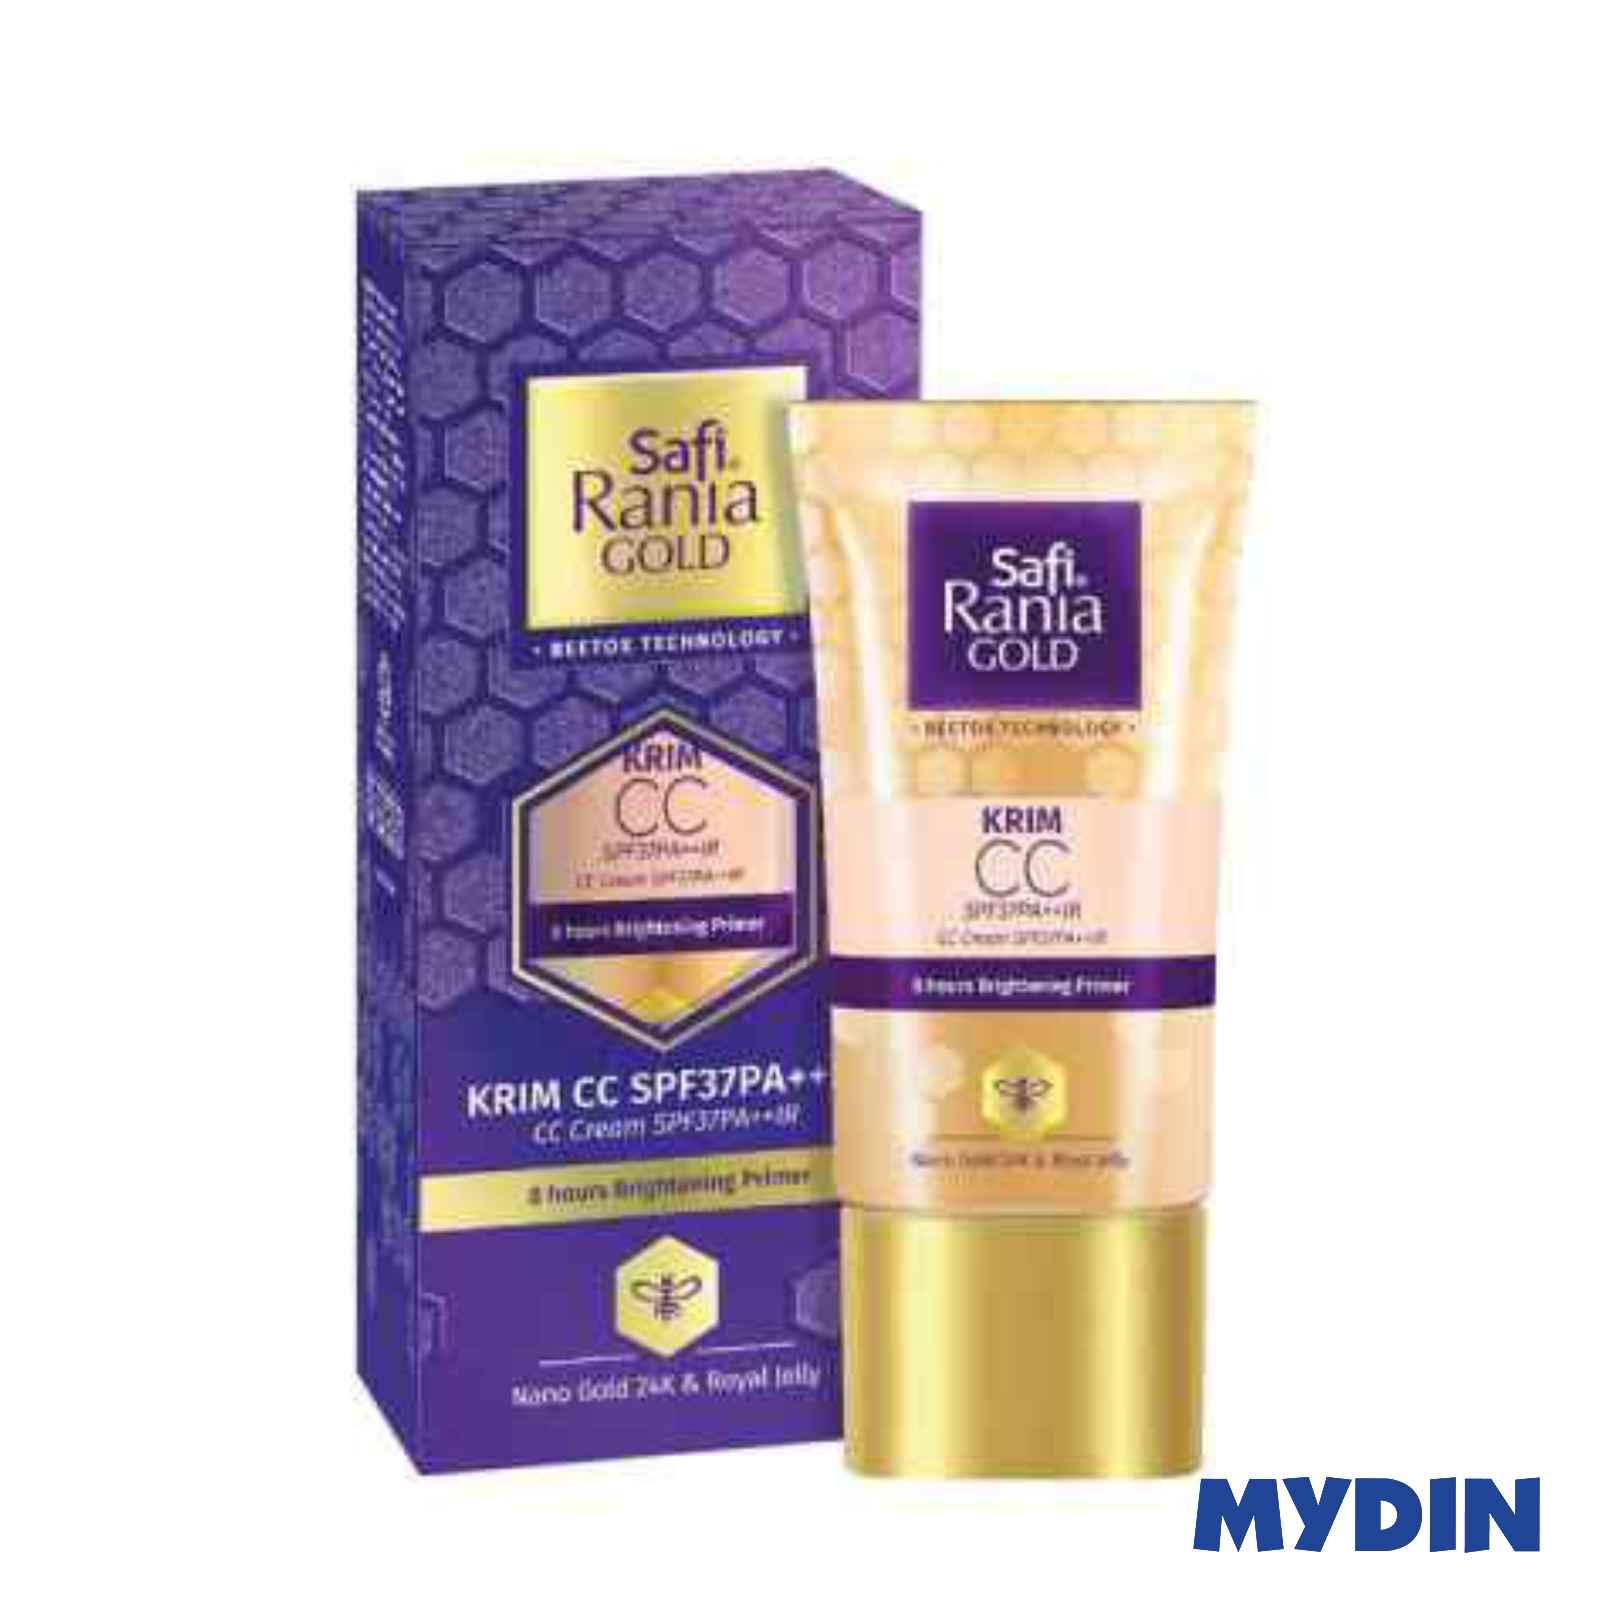 Safi Rania Gold CC Cream SPF37PA++ (25g)